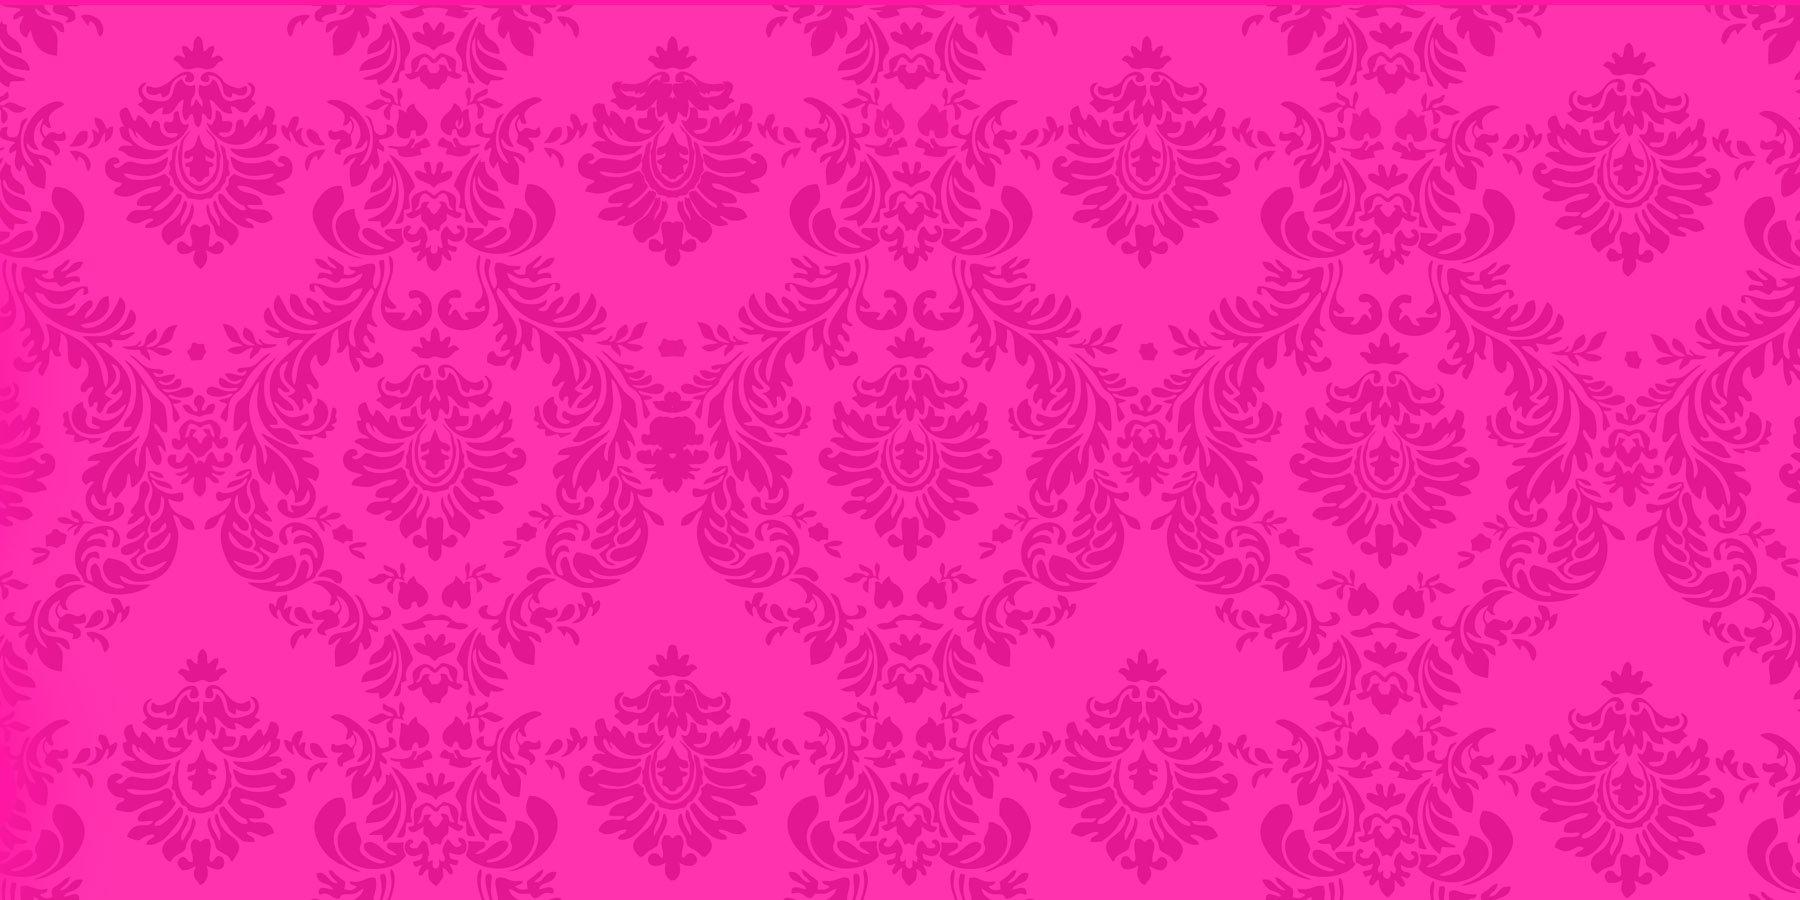 Wallpaper for salons wallpapersafari for Salon wallpaper